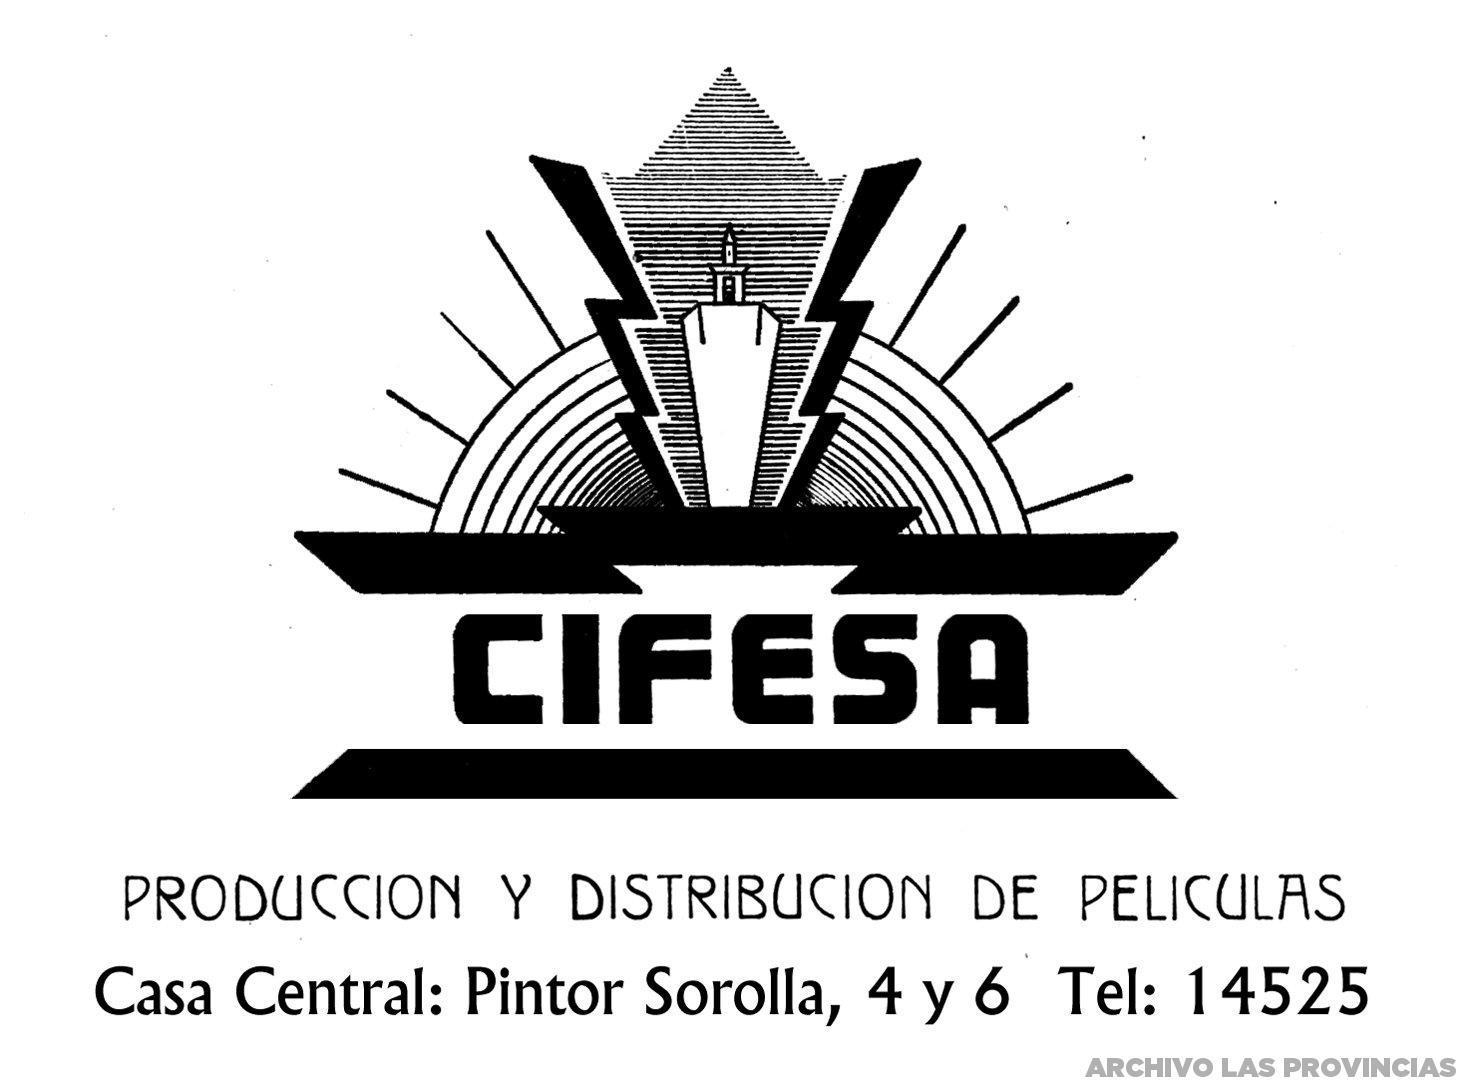 http://valenpedia.lasprovincias.es/sites/www.valenpedia.com/files/imagecache/Foto_original/1943/1943_p_cifesa.tif_.jpg